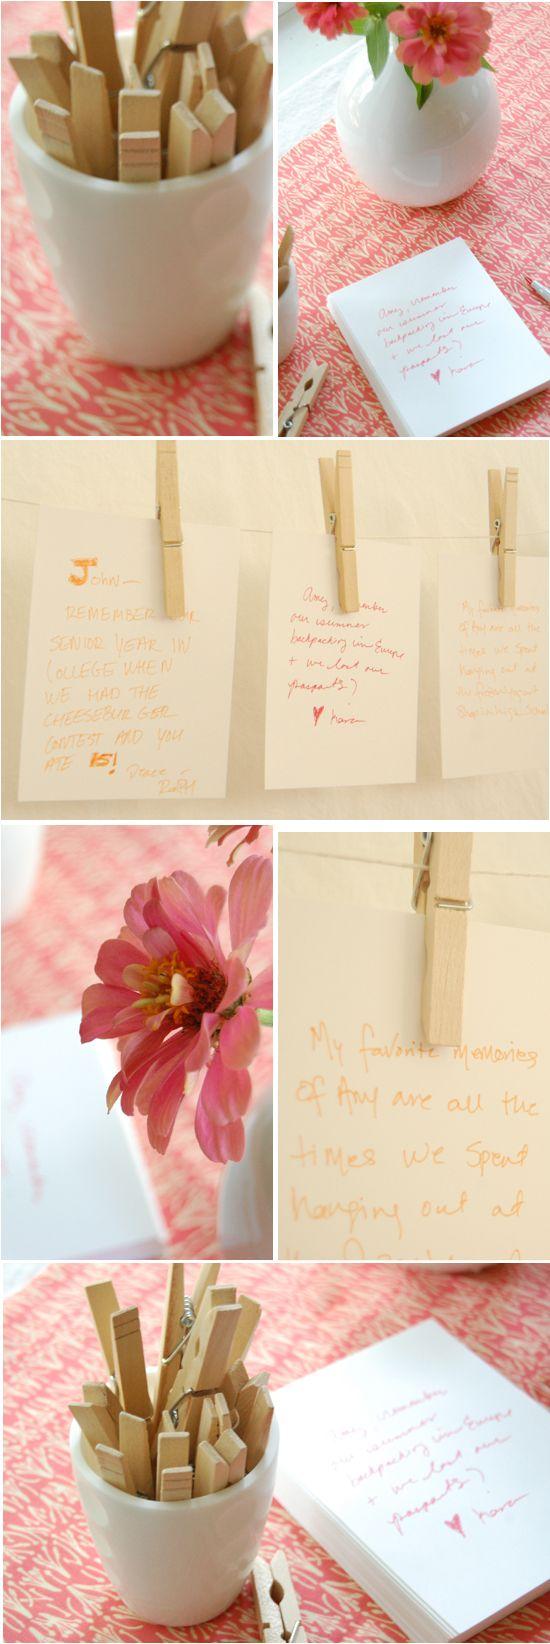 DIY Wedding: The Story Line - Project Wedding